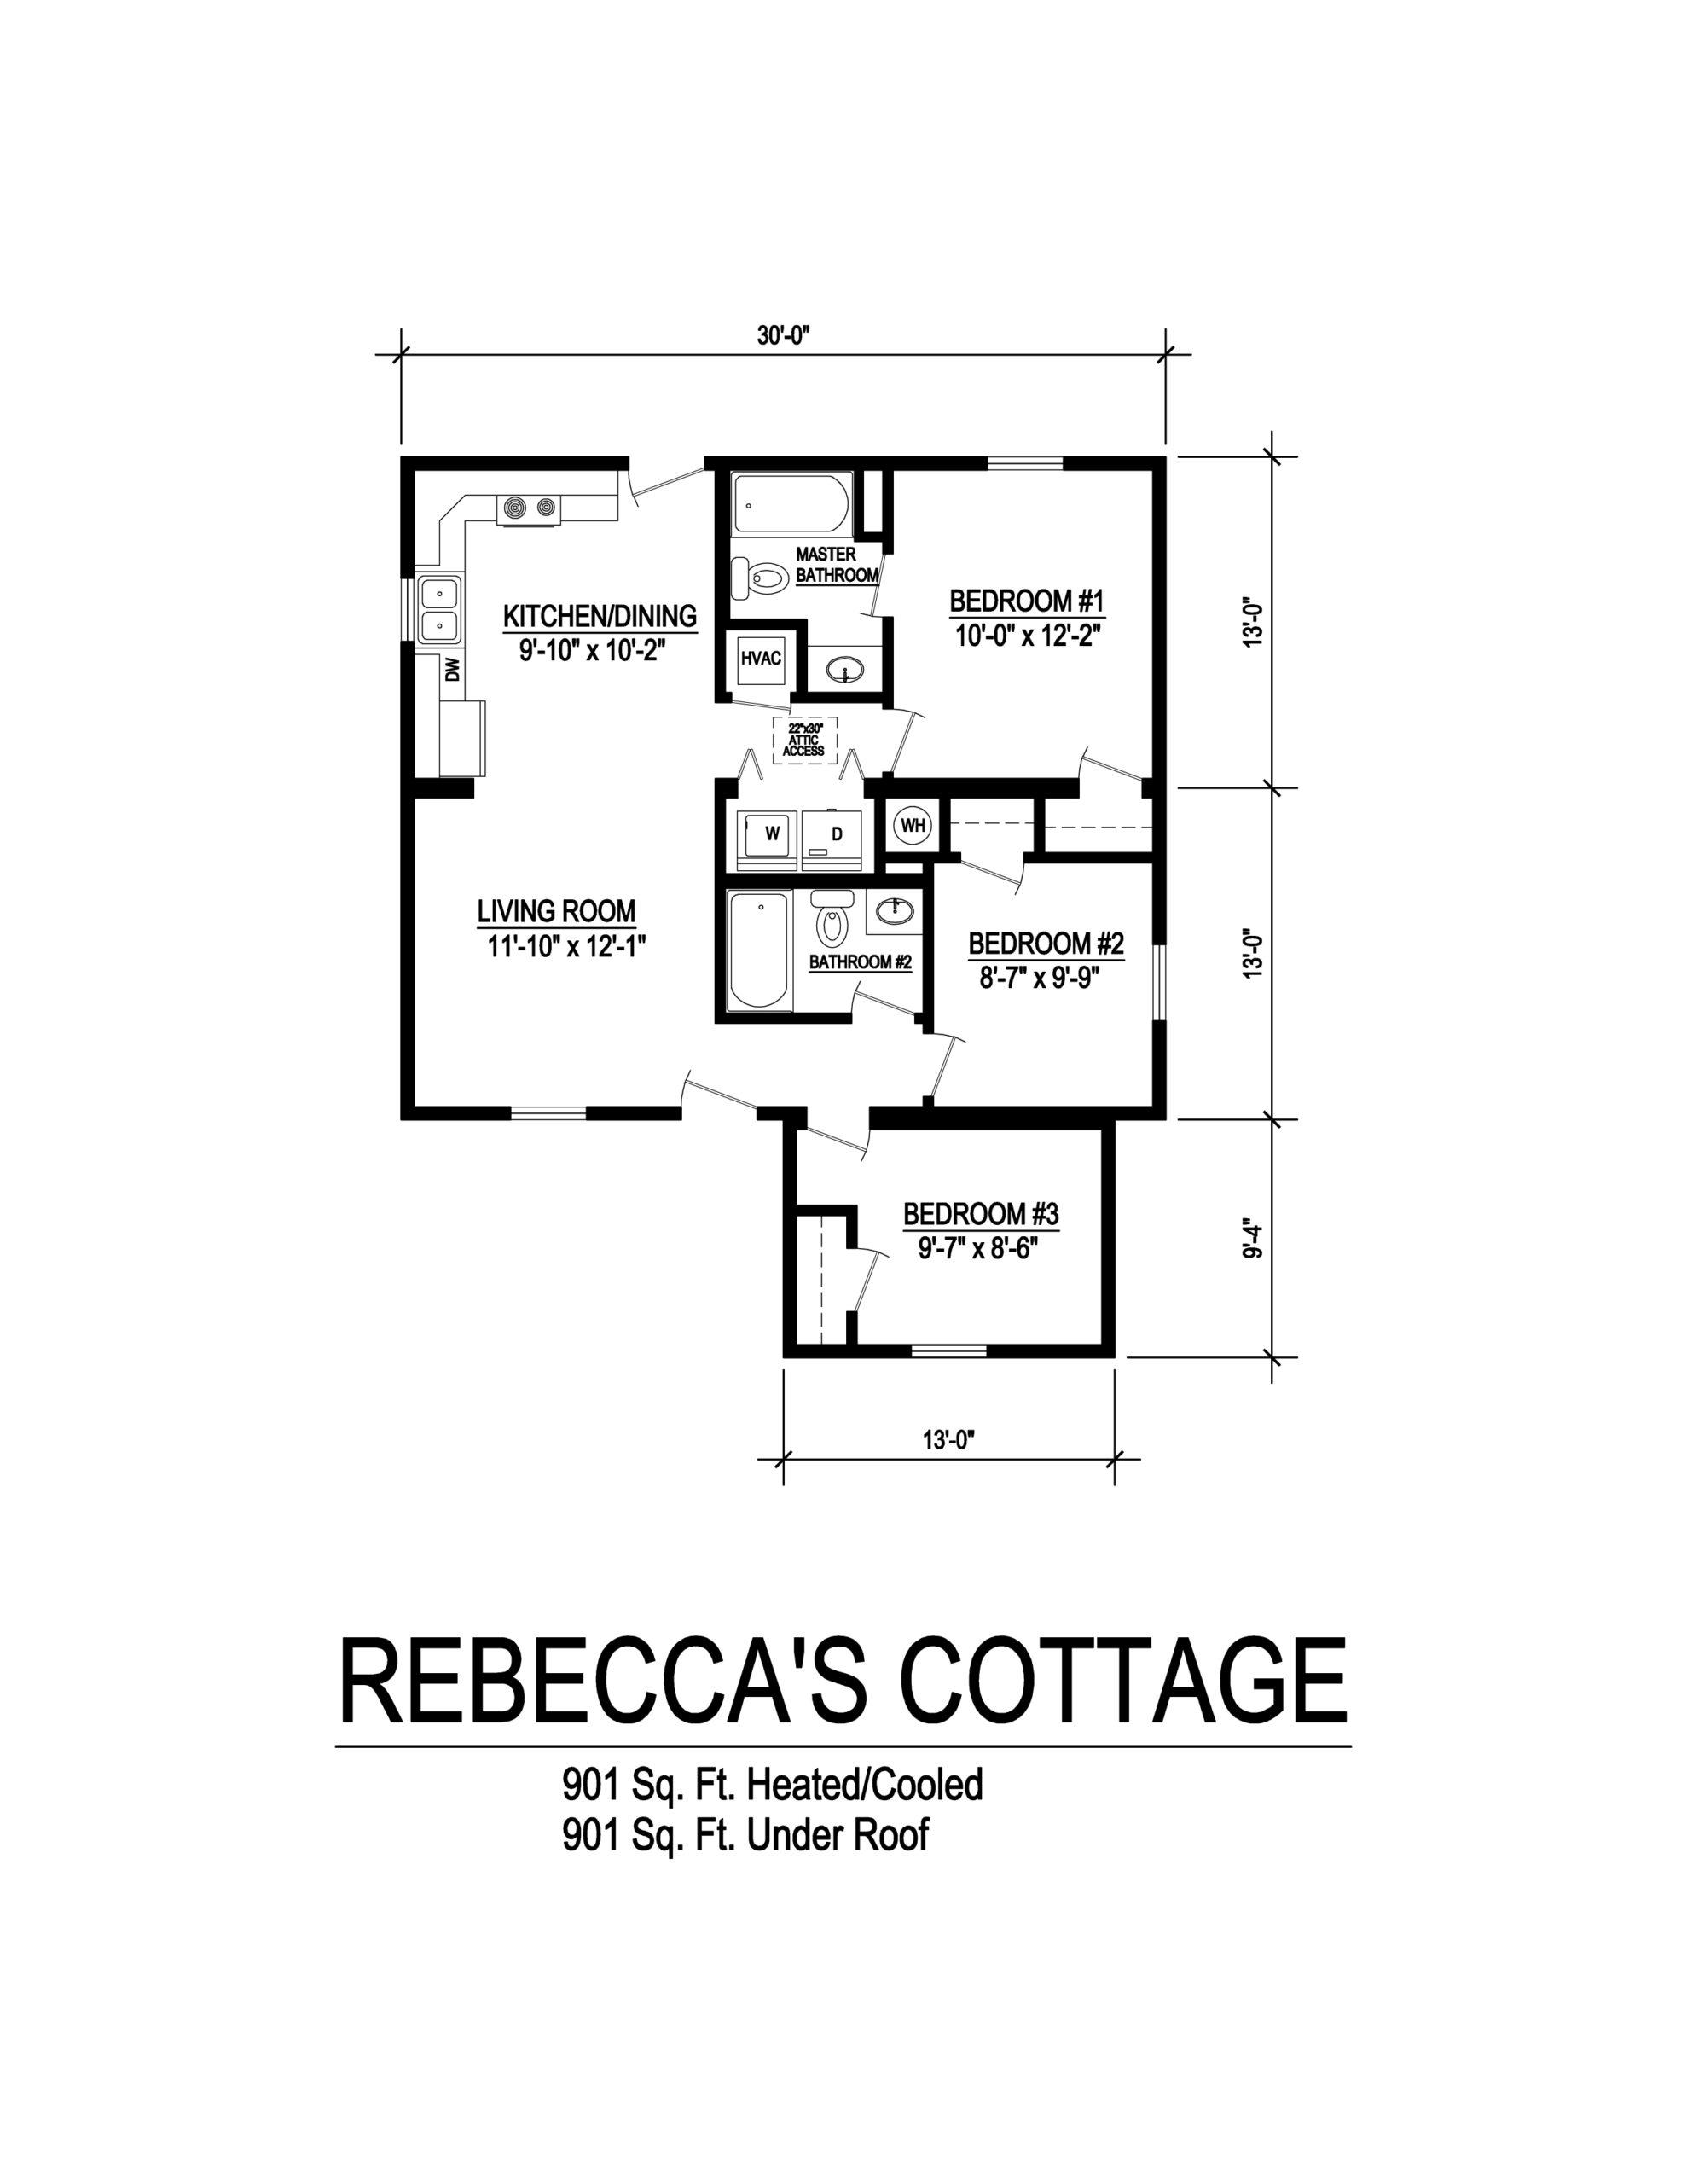 rebeccas cottage modular home floorplan